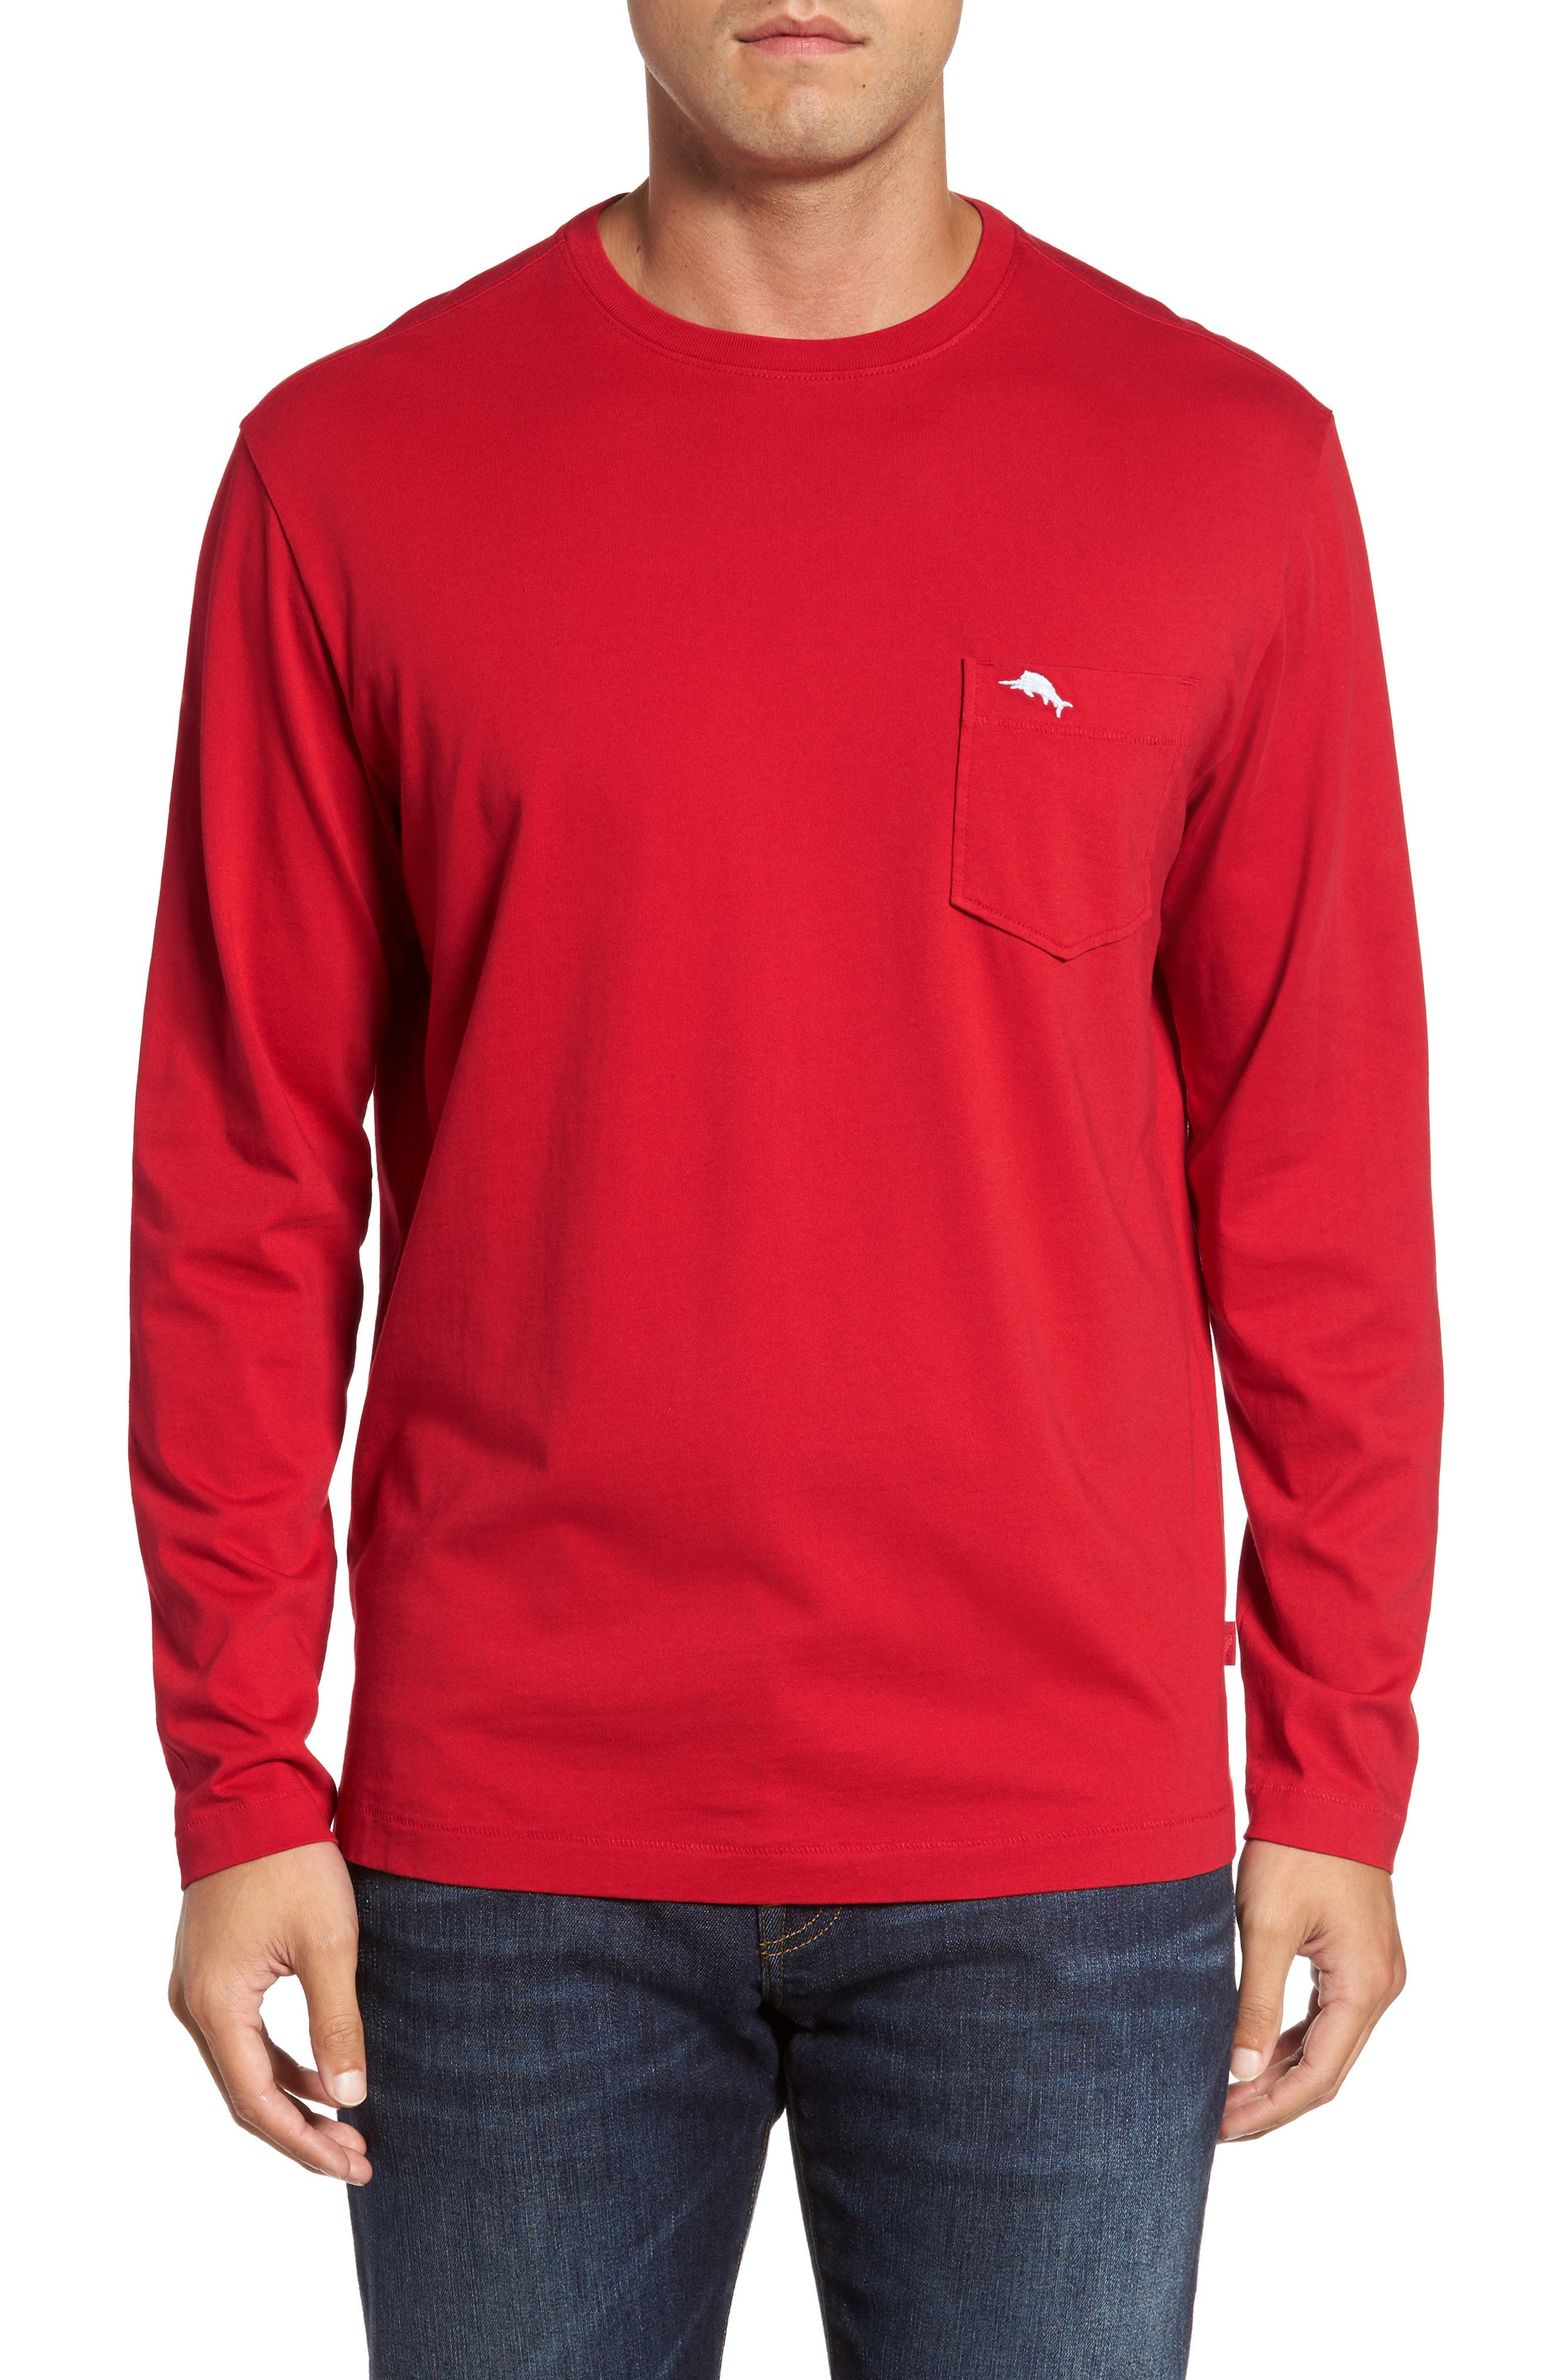 Alternate Image 1 Selected - Tommy Bahama Bali Skyline Long Sleeve Pima Cotton T-Shirt